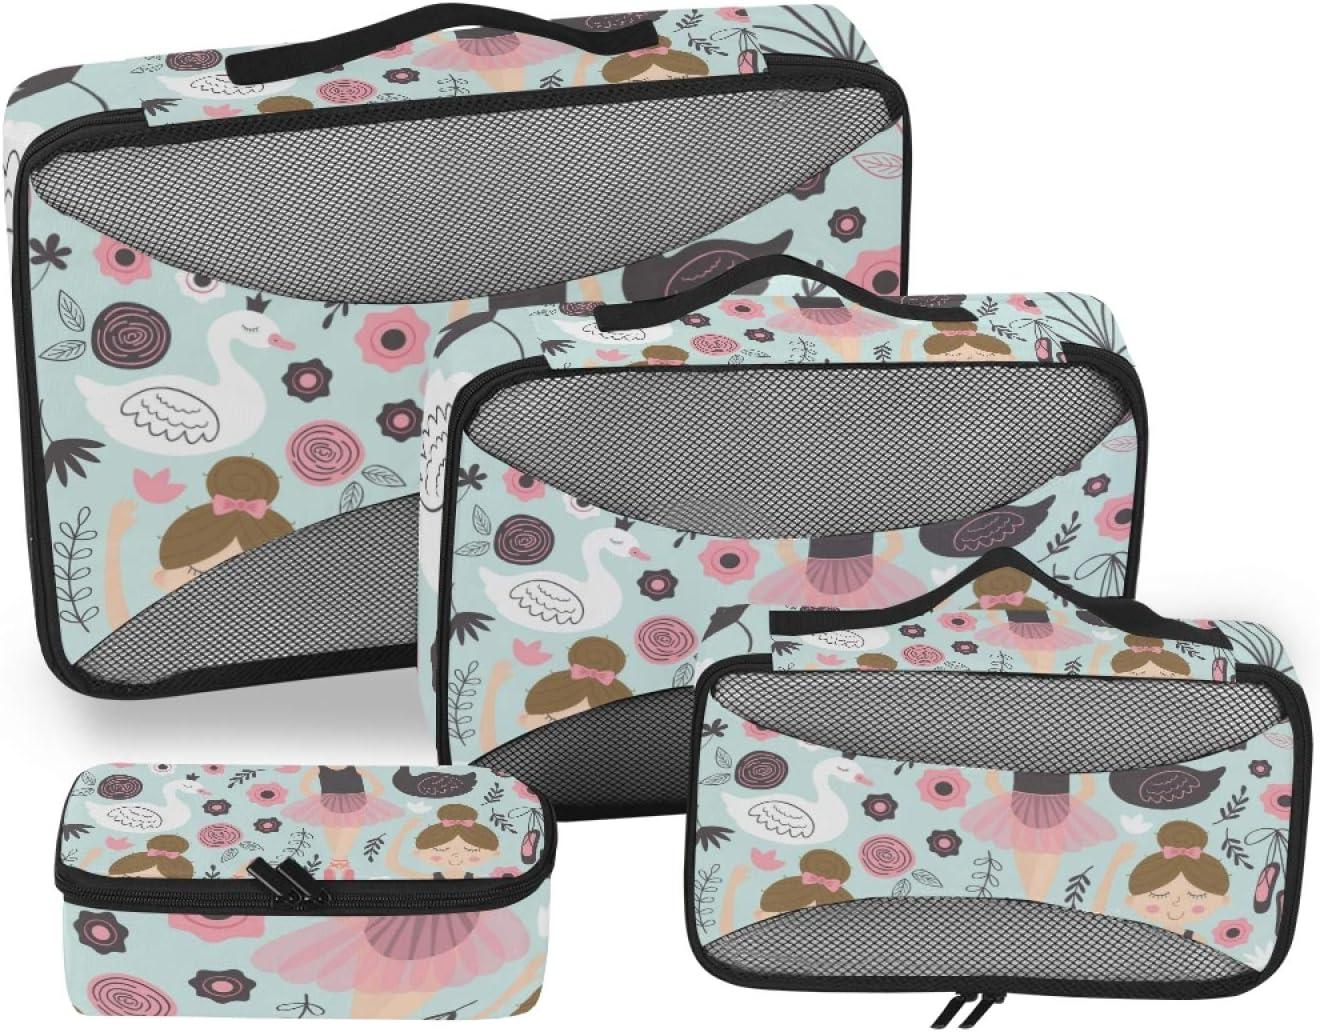 Swan Girl Packing Cubes 4-Pcs Super Direct sale of manufacturer intense SALE Organizer Stora Accessories Travel